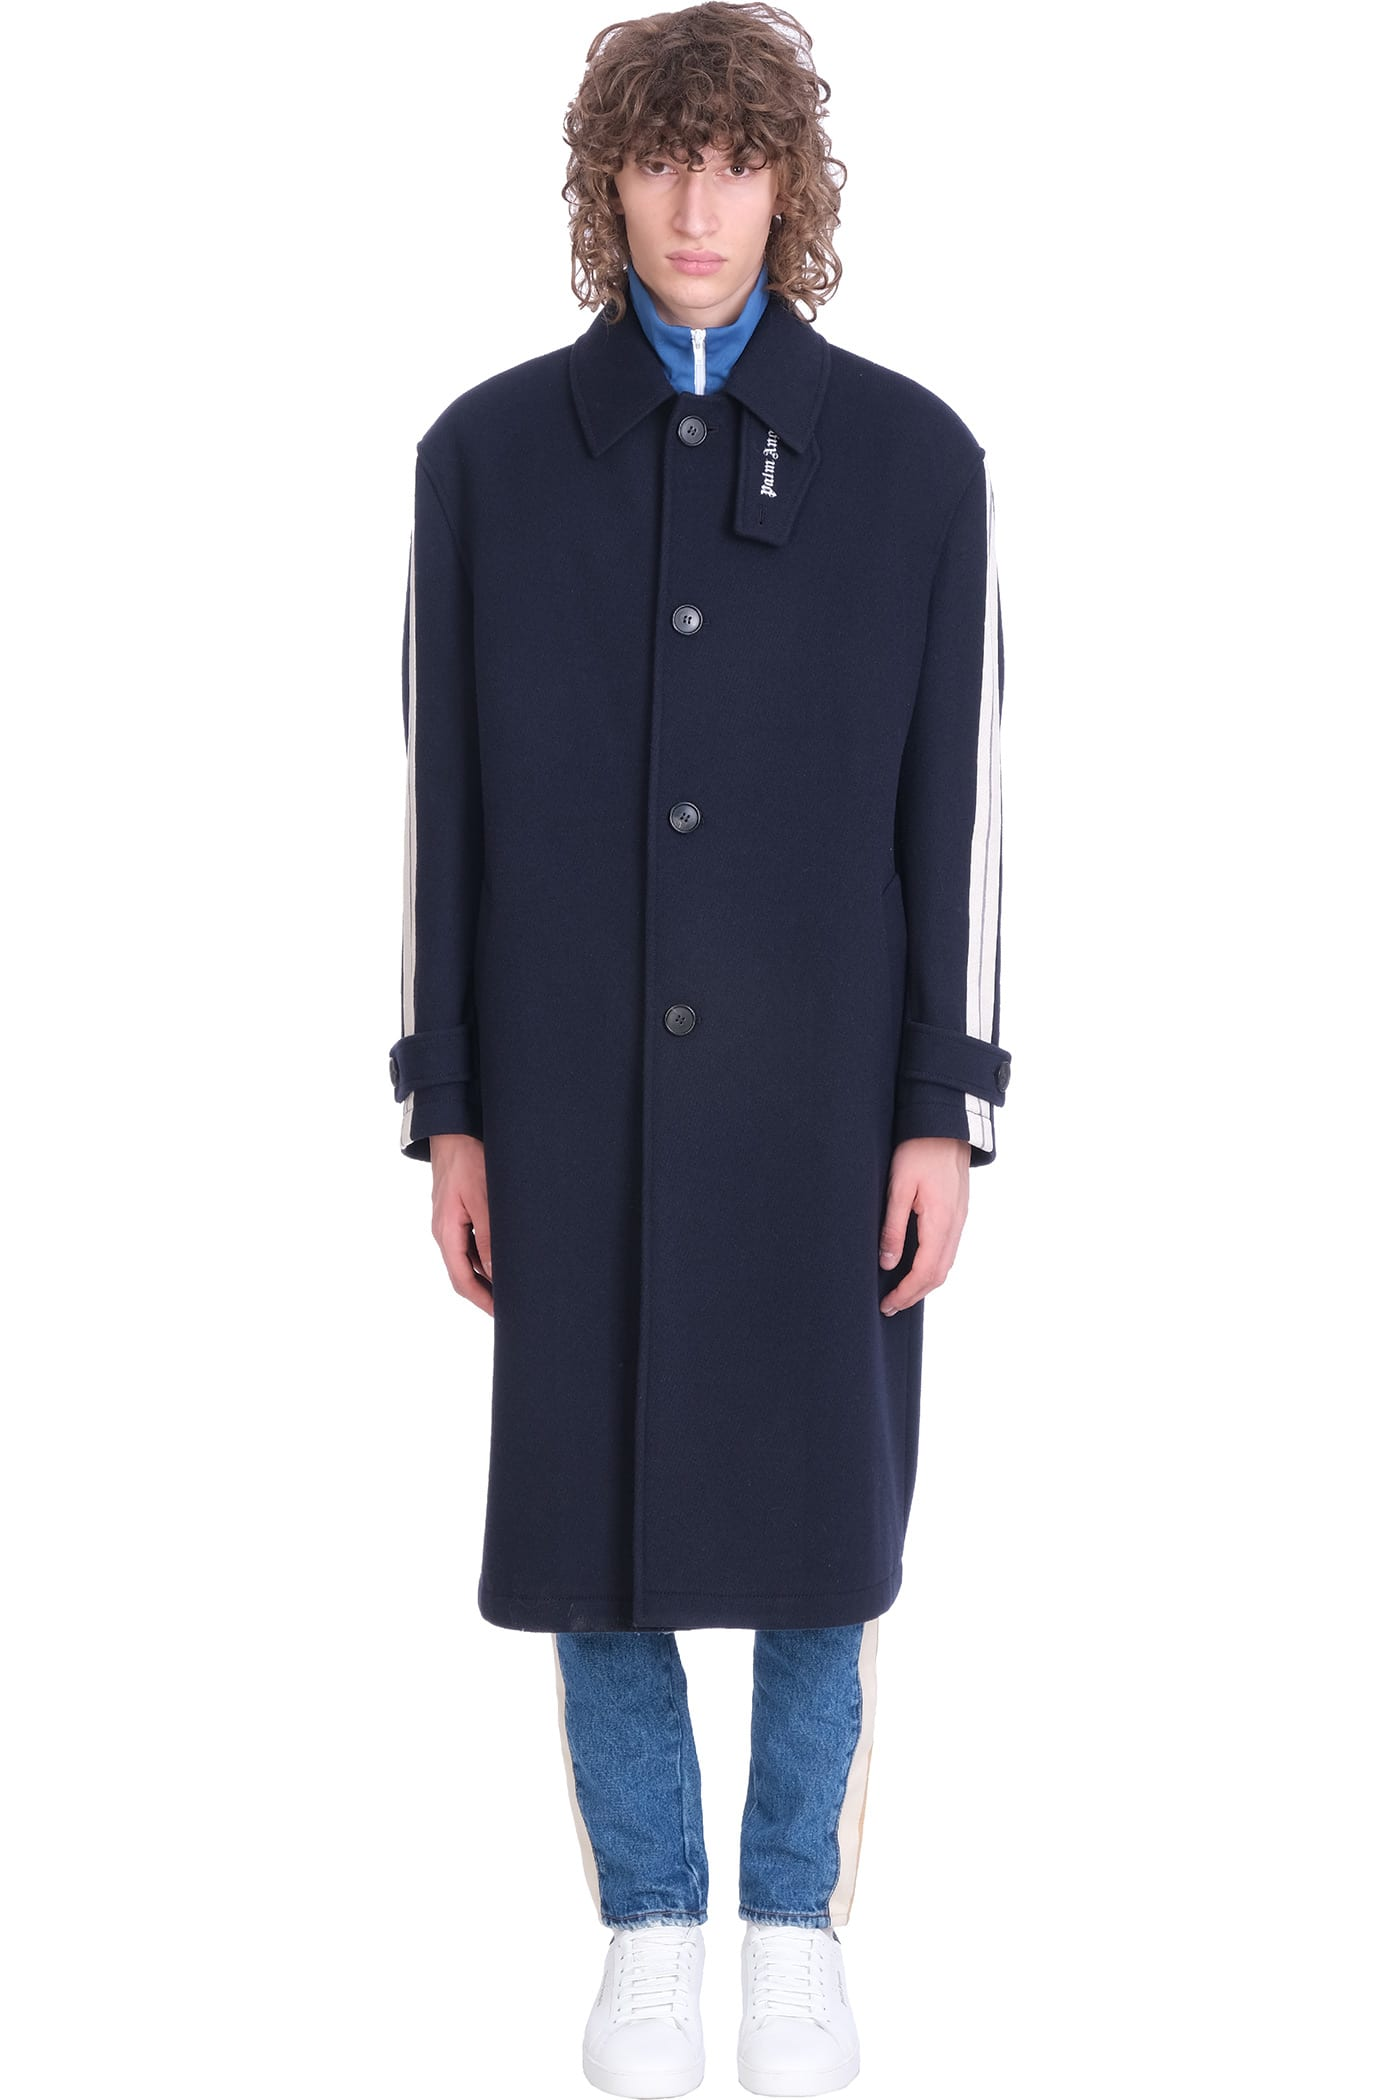 Palm Angels Coat In Blue Wool